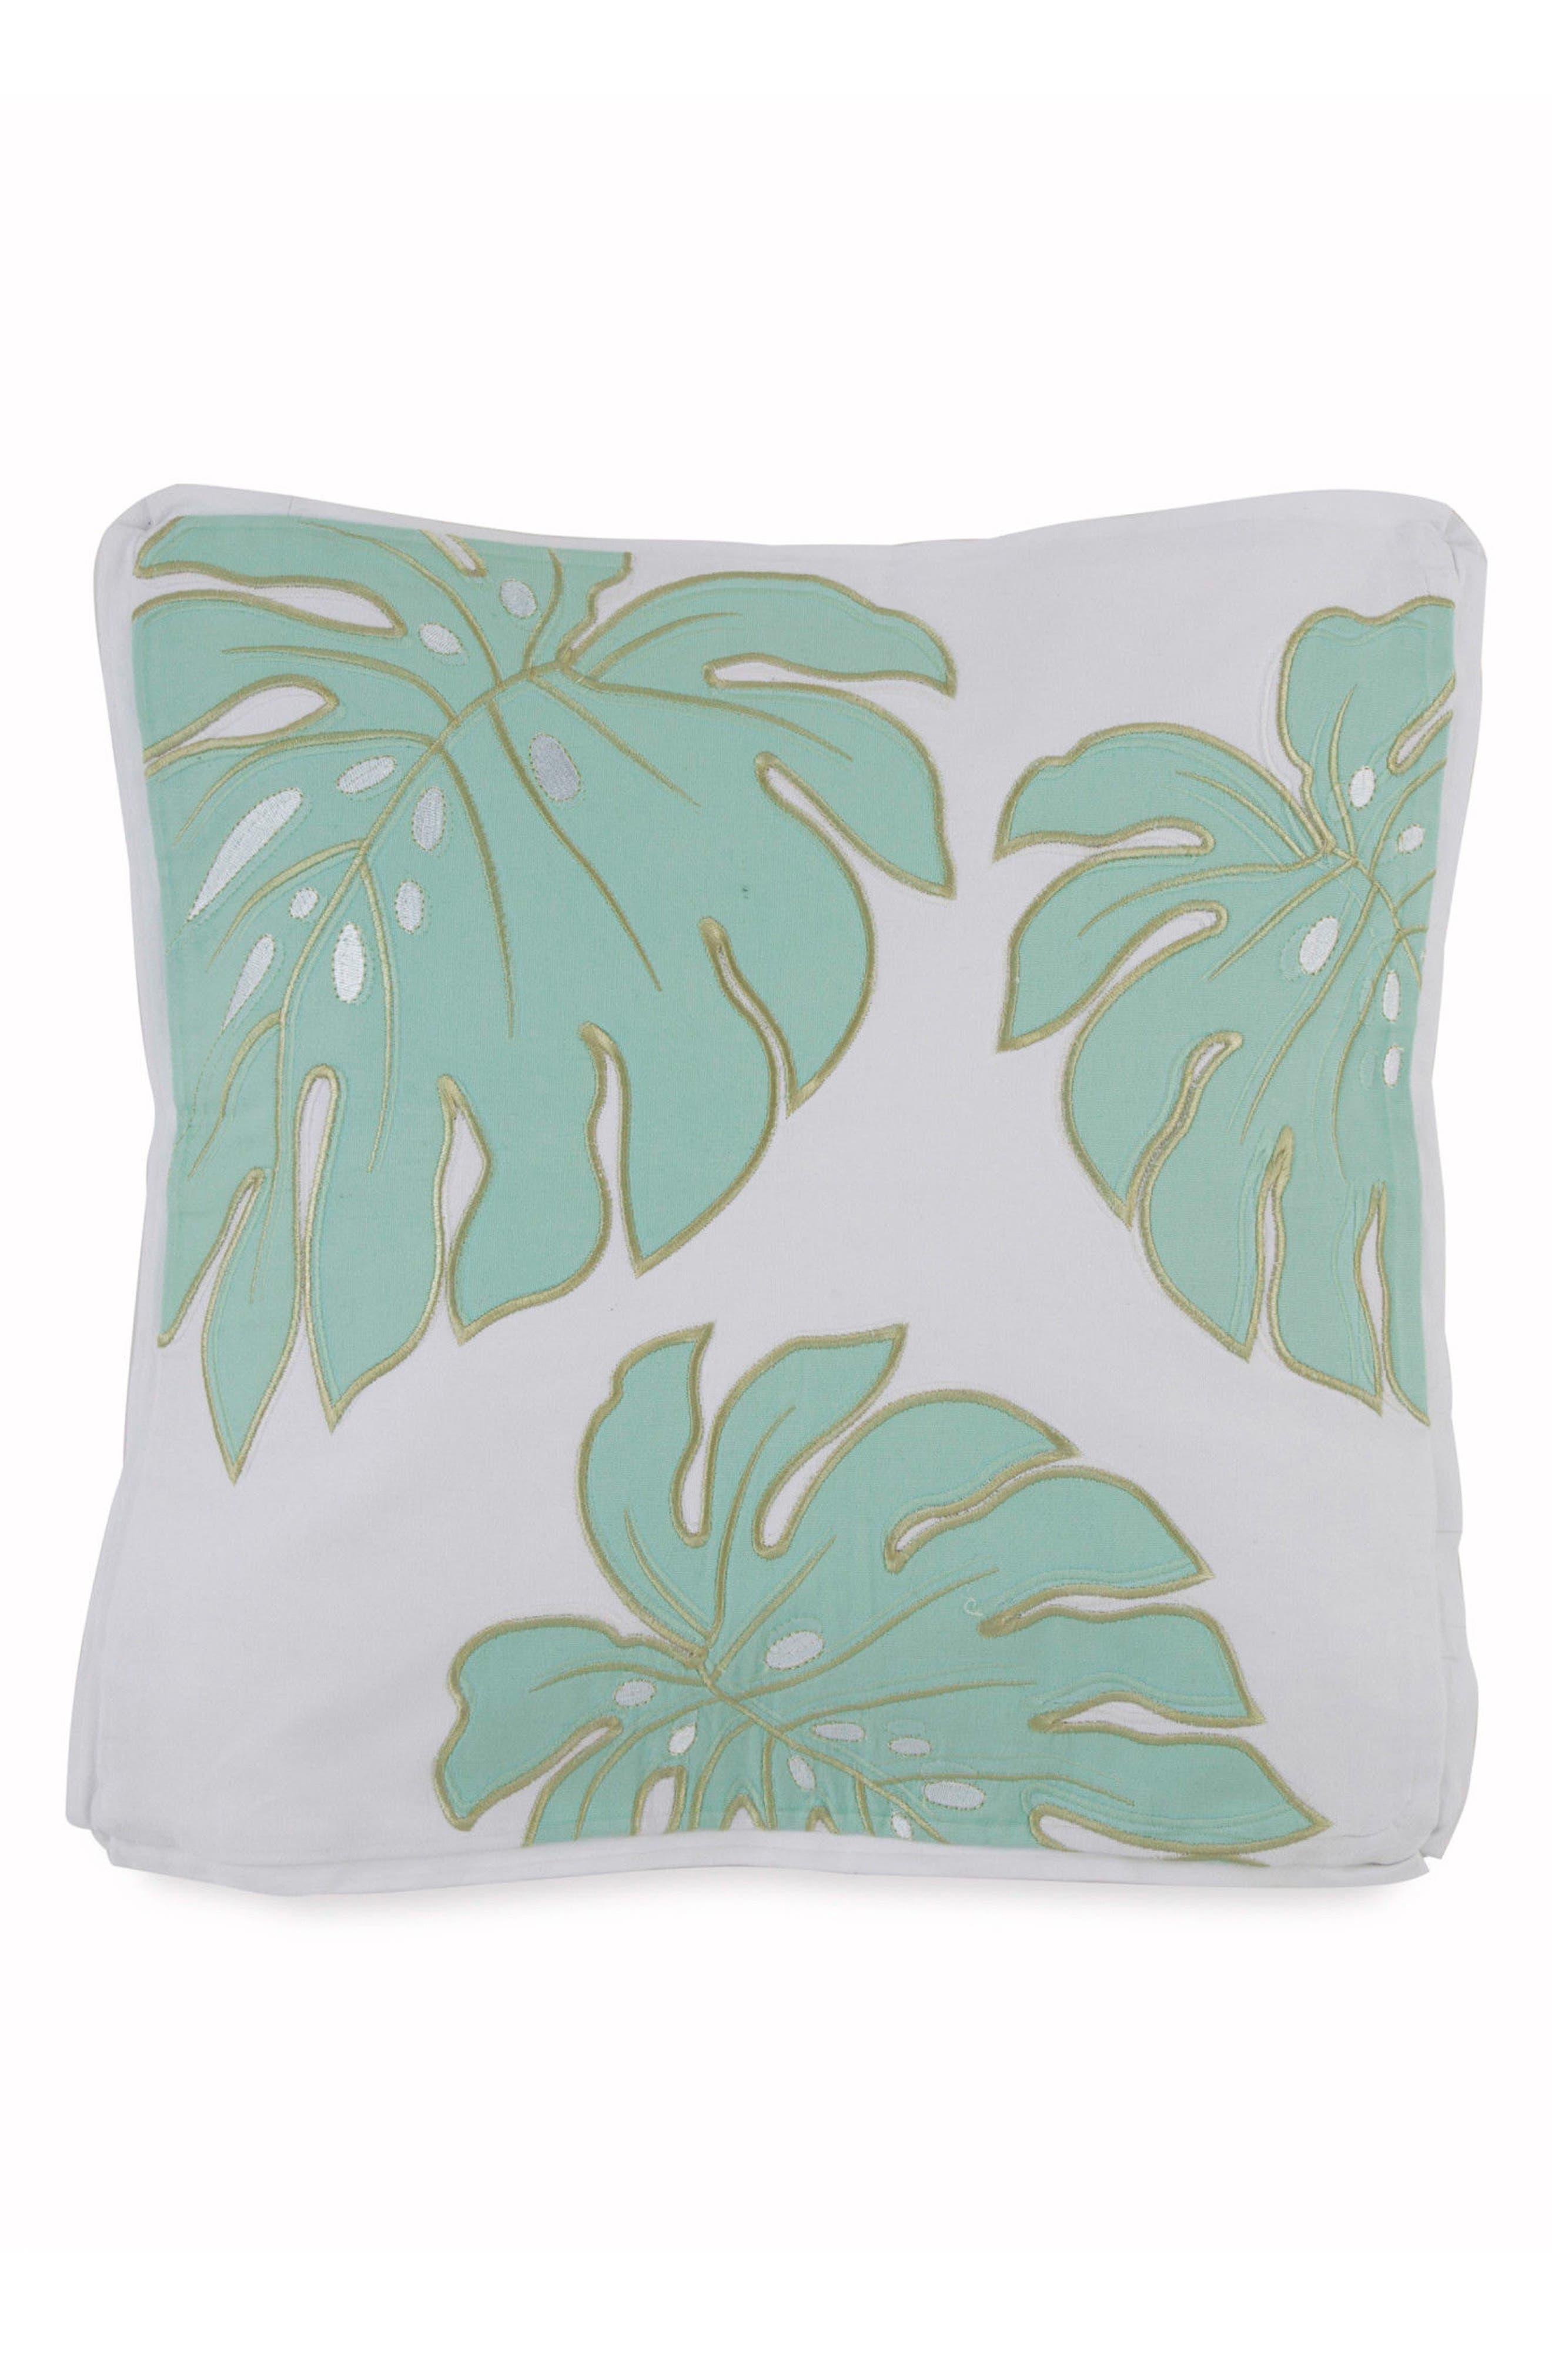 Tropical Retreat Monstera Leaf Square Accent Pillow,                             Main thumbnail 1, color,                             White Multi